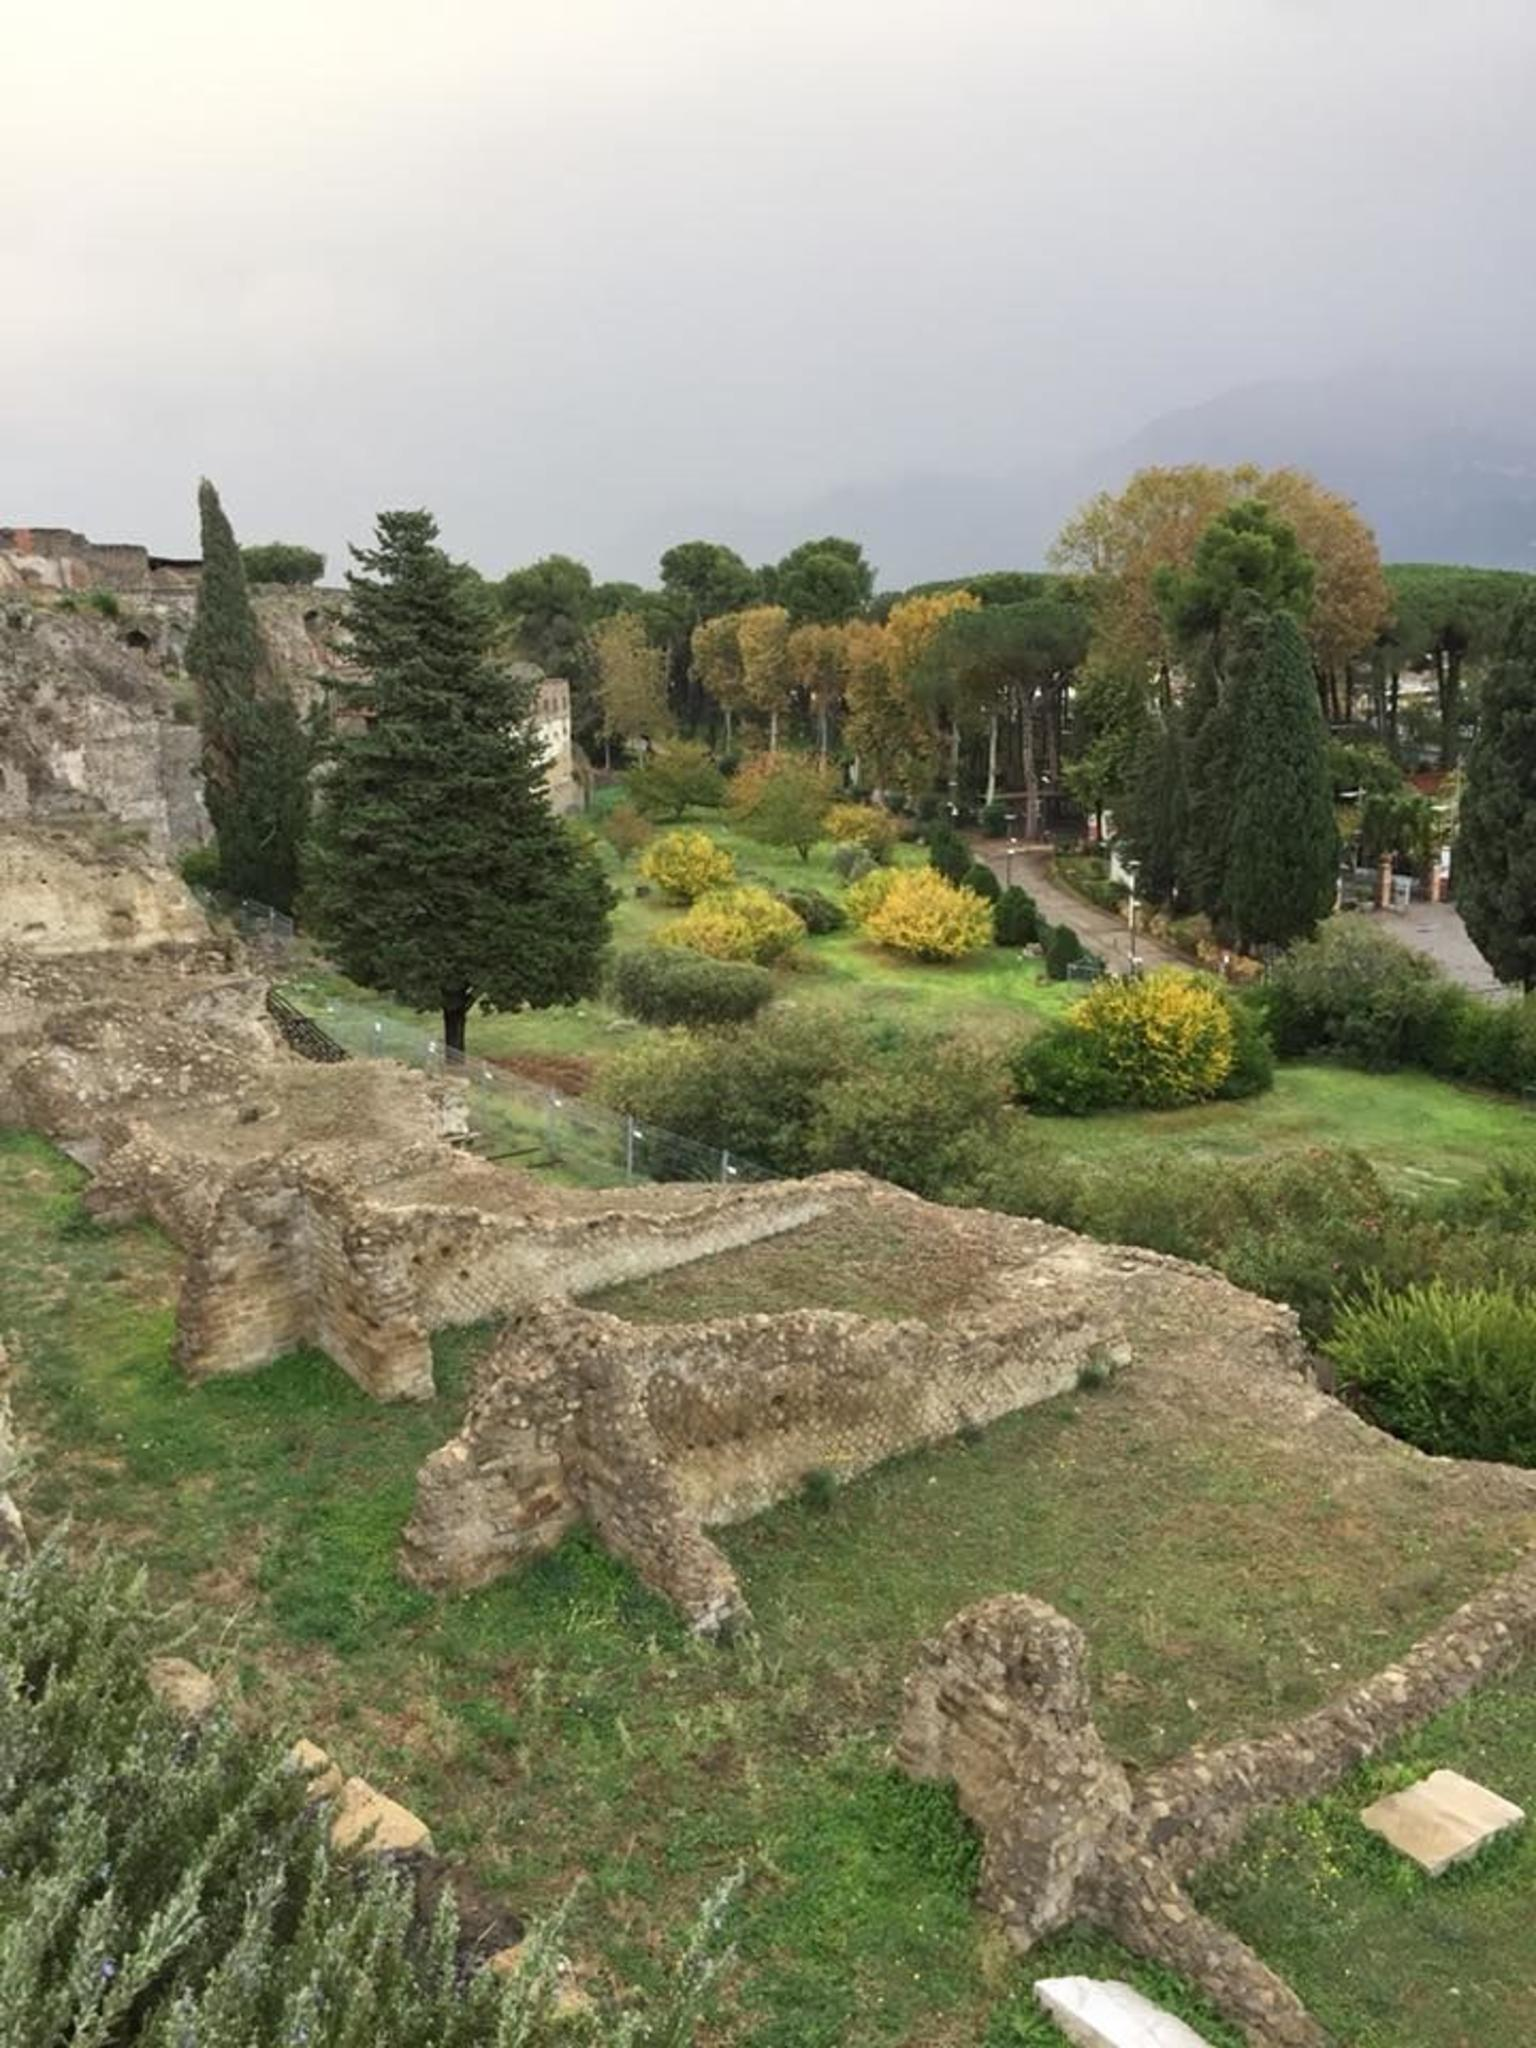 MORE PHOTOS, Daily Pompeii and Amalfi Coast Tour from Naples